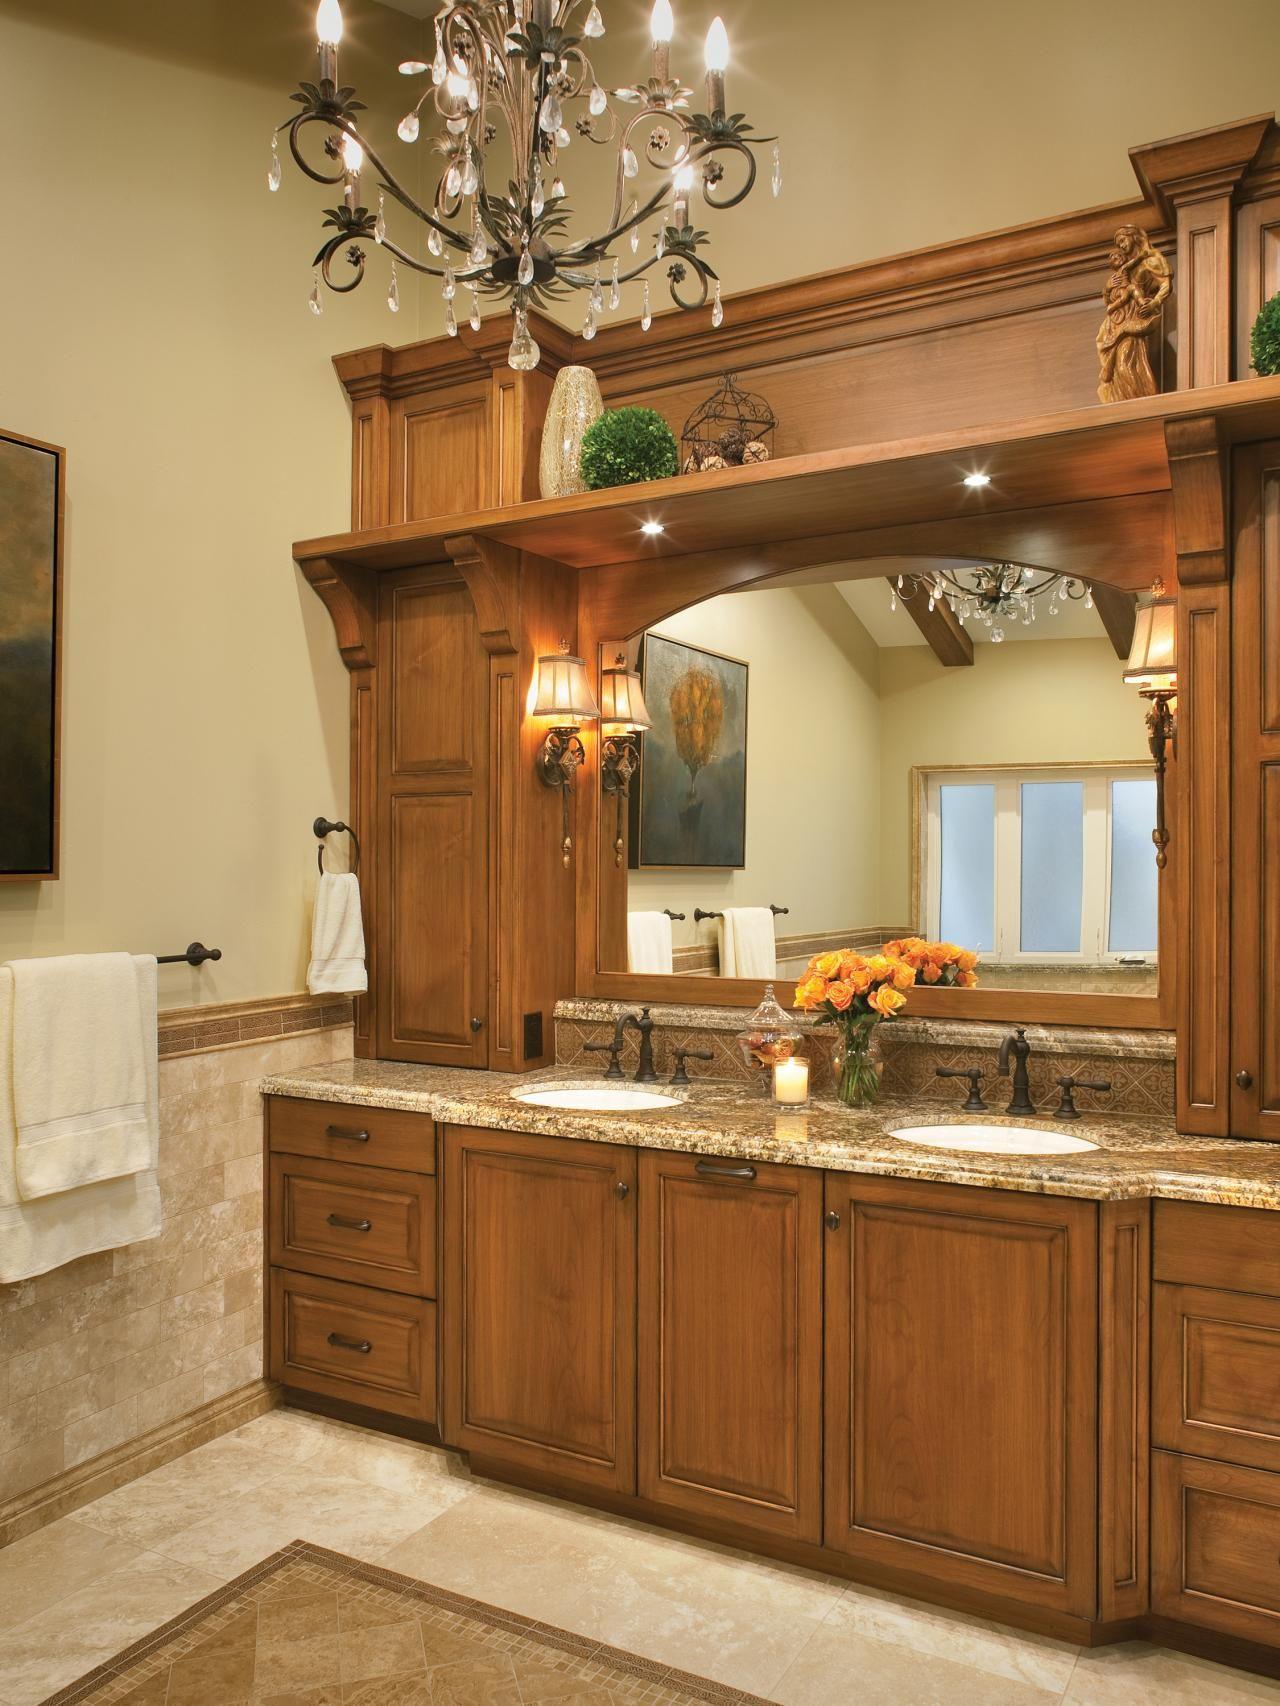 Romantic Bathroom Lighting Ideas | Romantic bathrooms, Hgtv and Bath ...